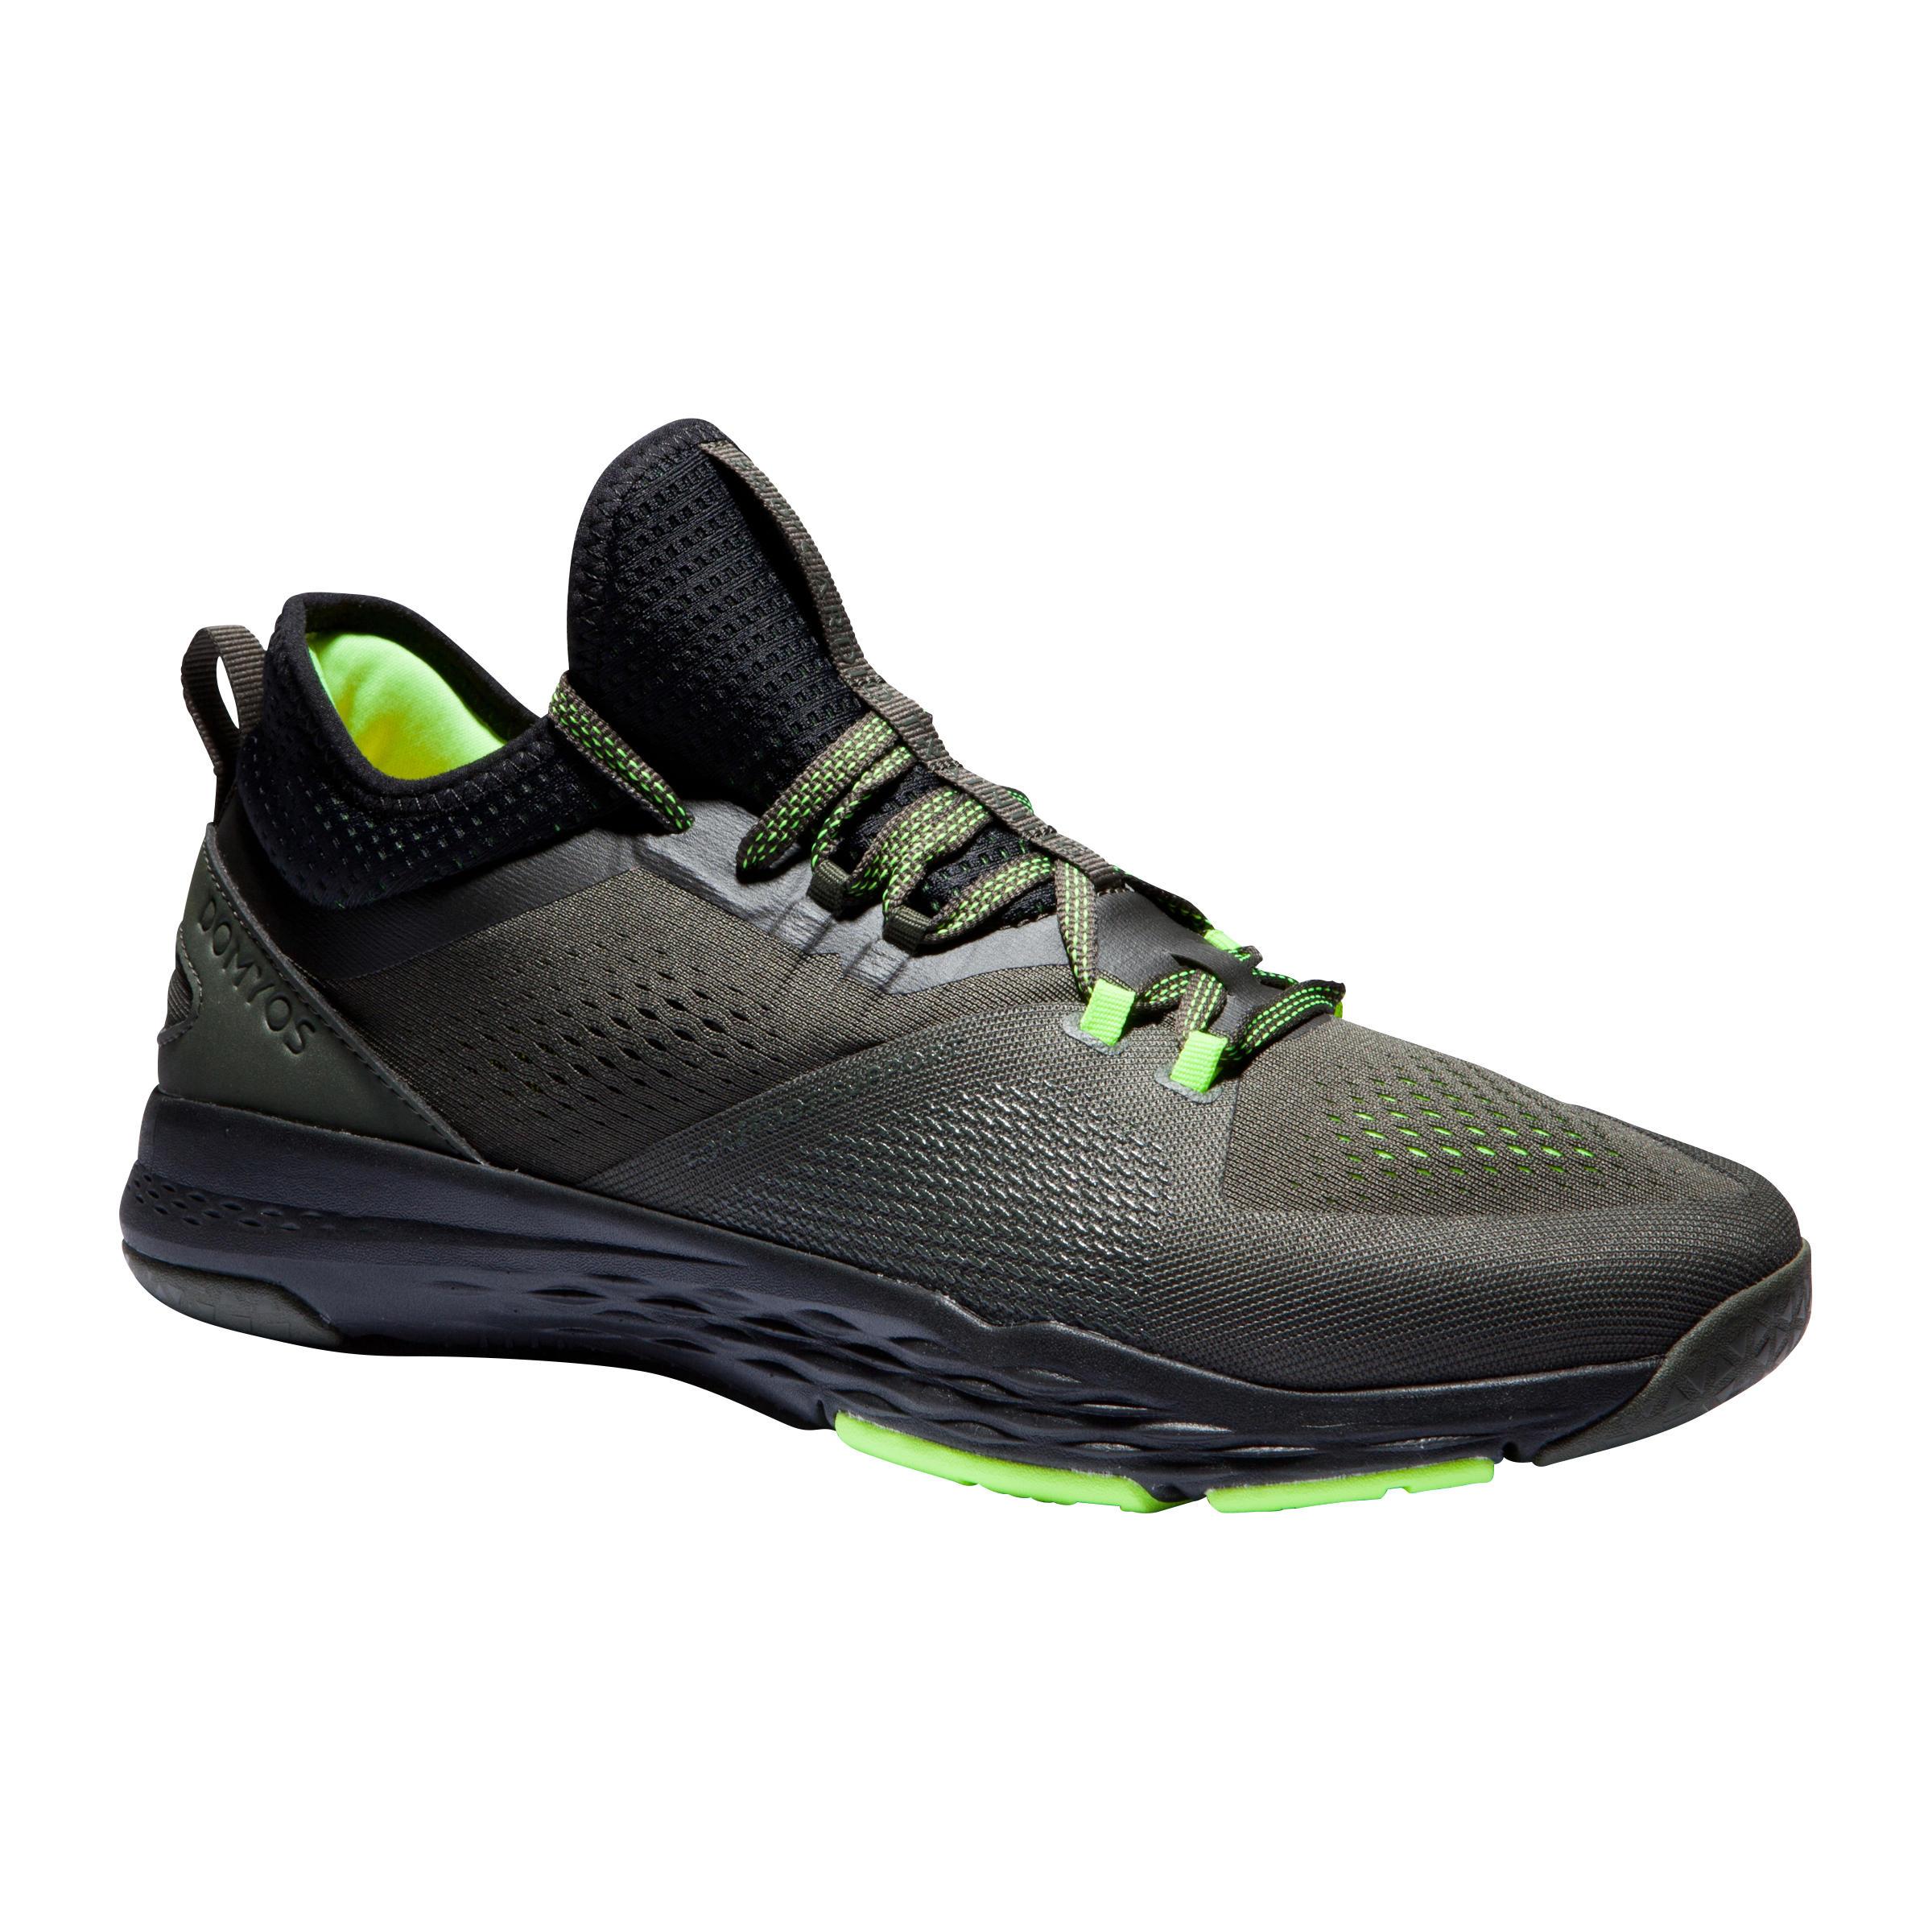 Comprar Zapatillas de Fitness Online  51927076e8fea